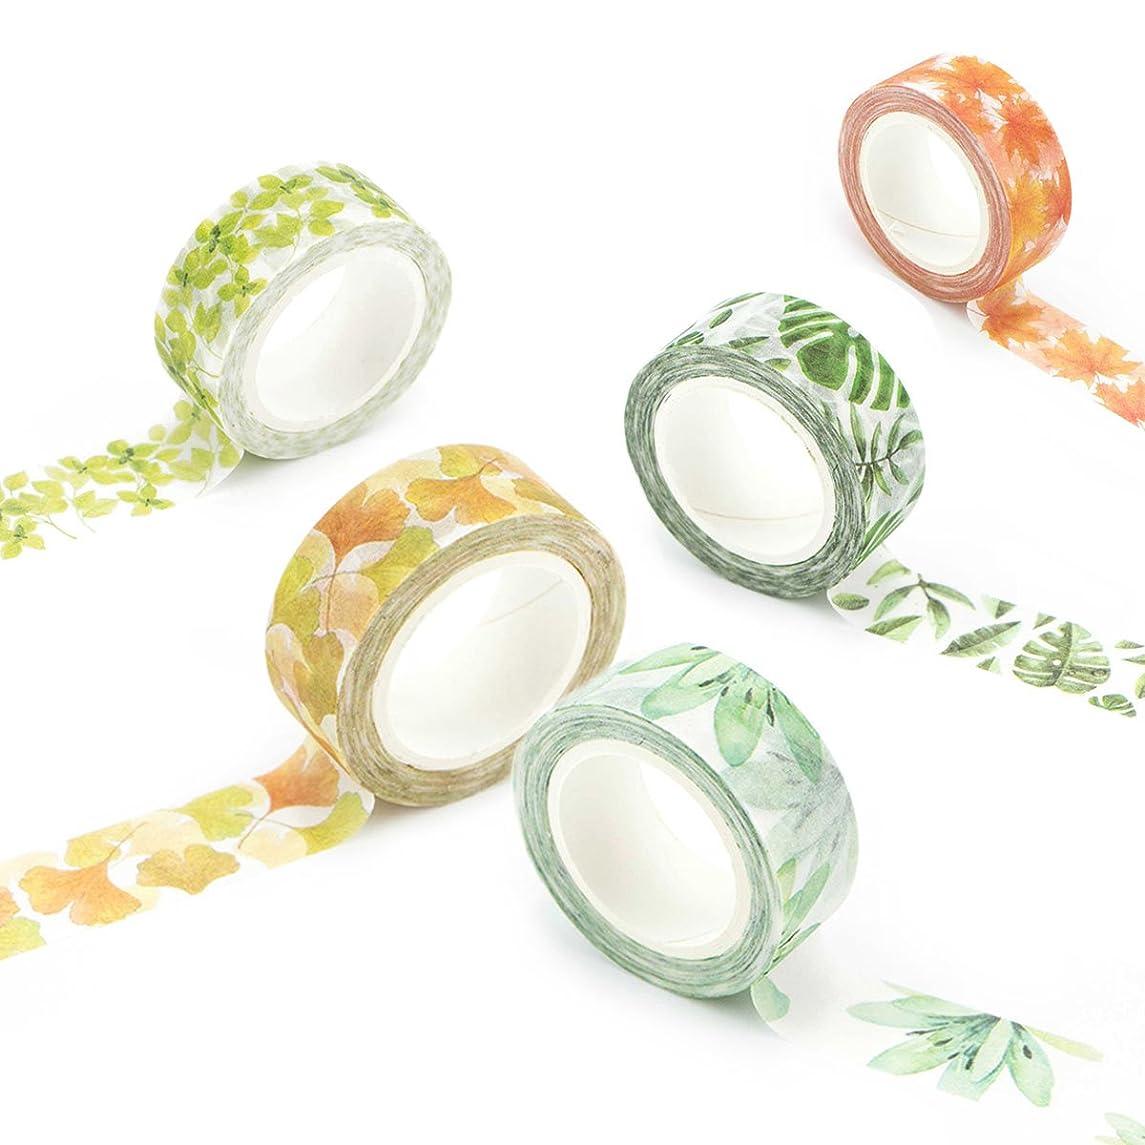 Washi Tape Set Masking Tape Art Crafty Rolls Decorate DIY Adhesive Paper Tape 15mmX7mm Floral/Leaf